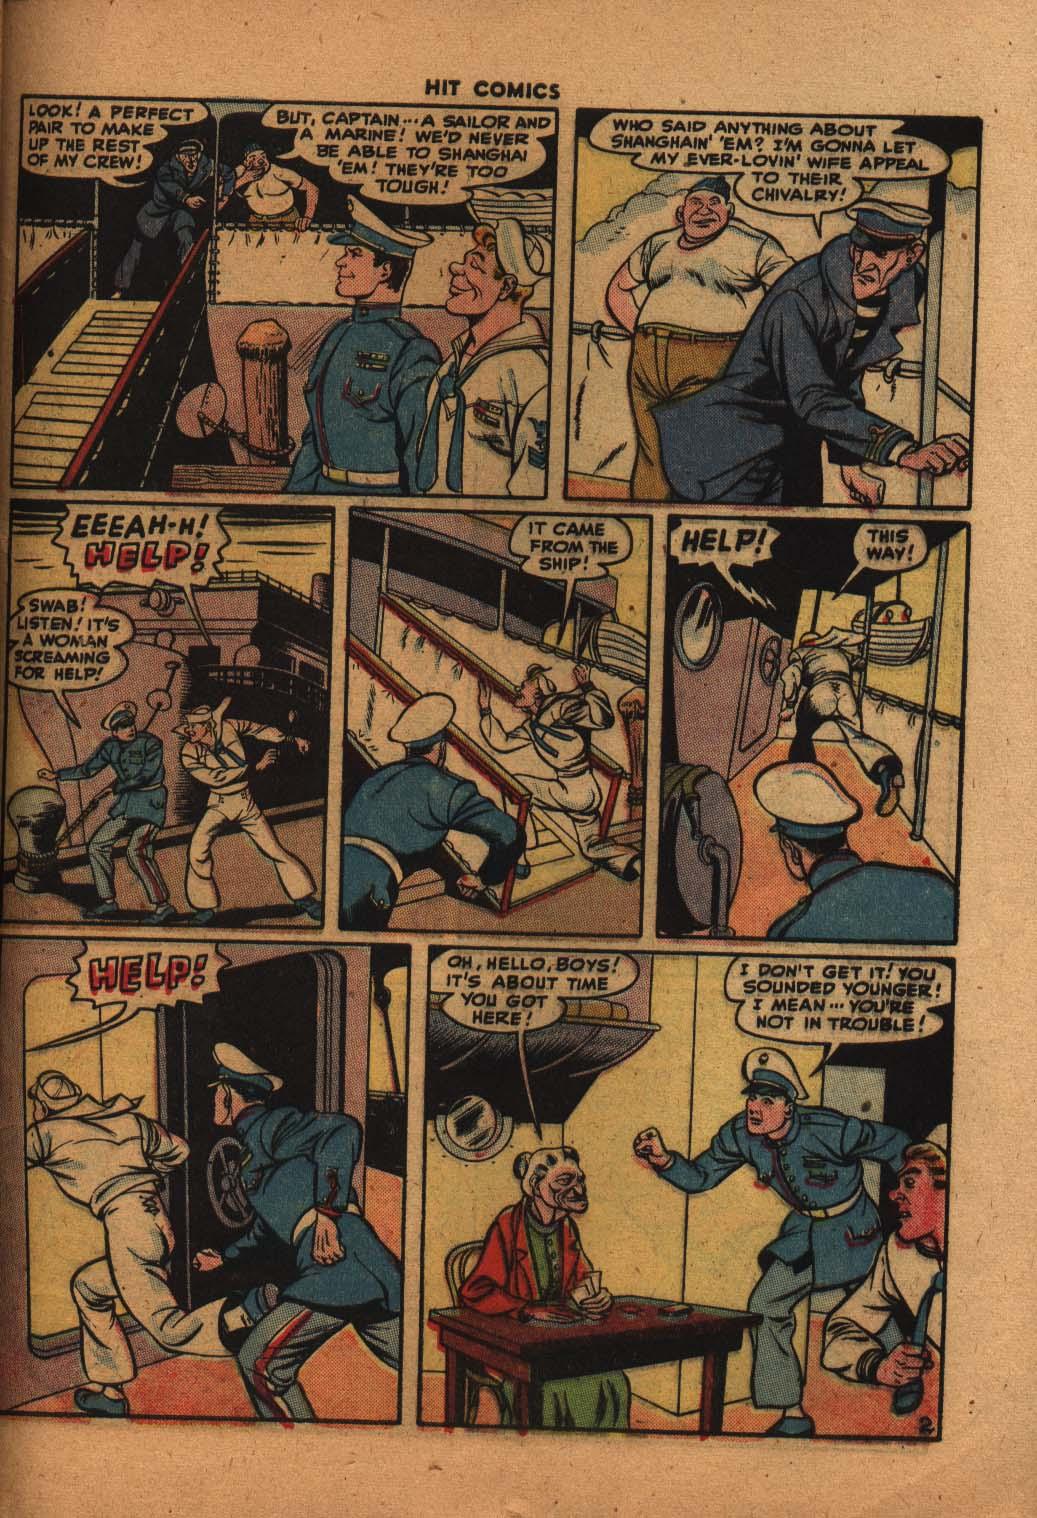 Read online Hit Comics comic -  Issue #47 - 40